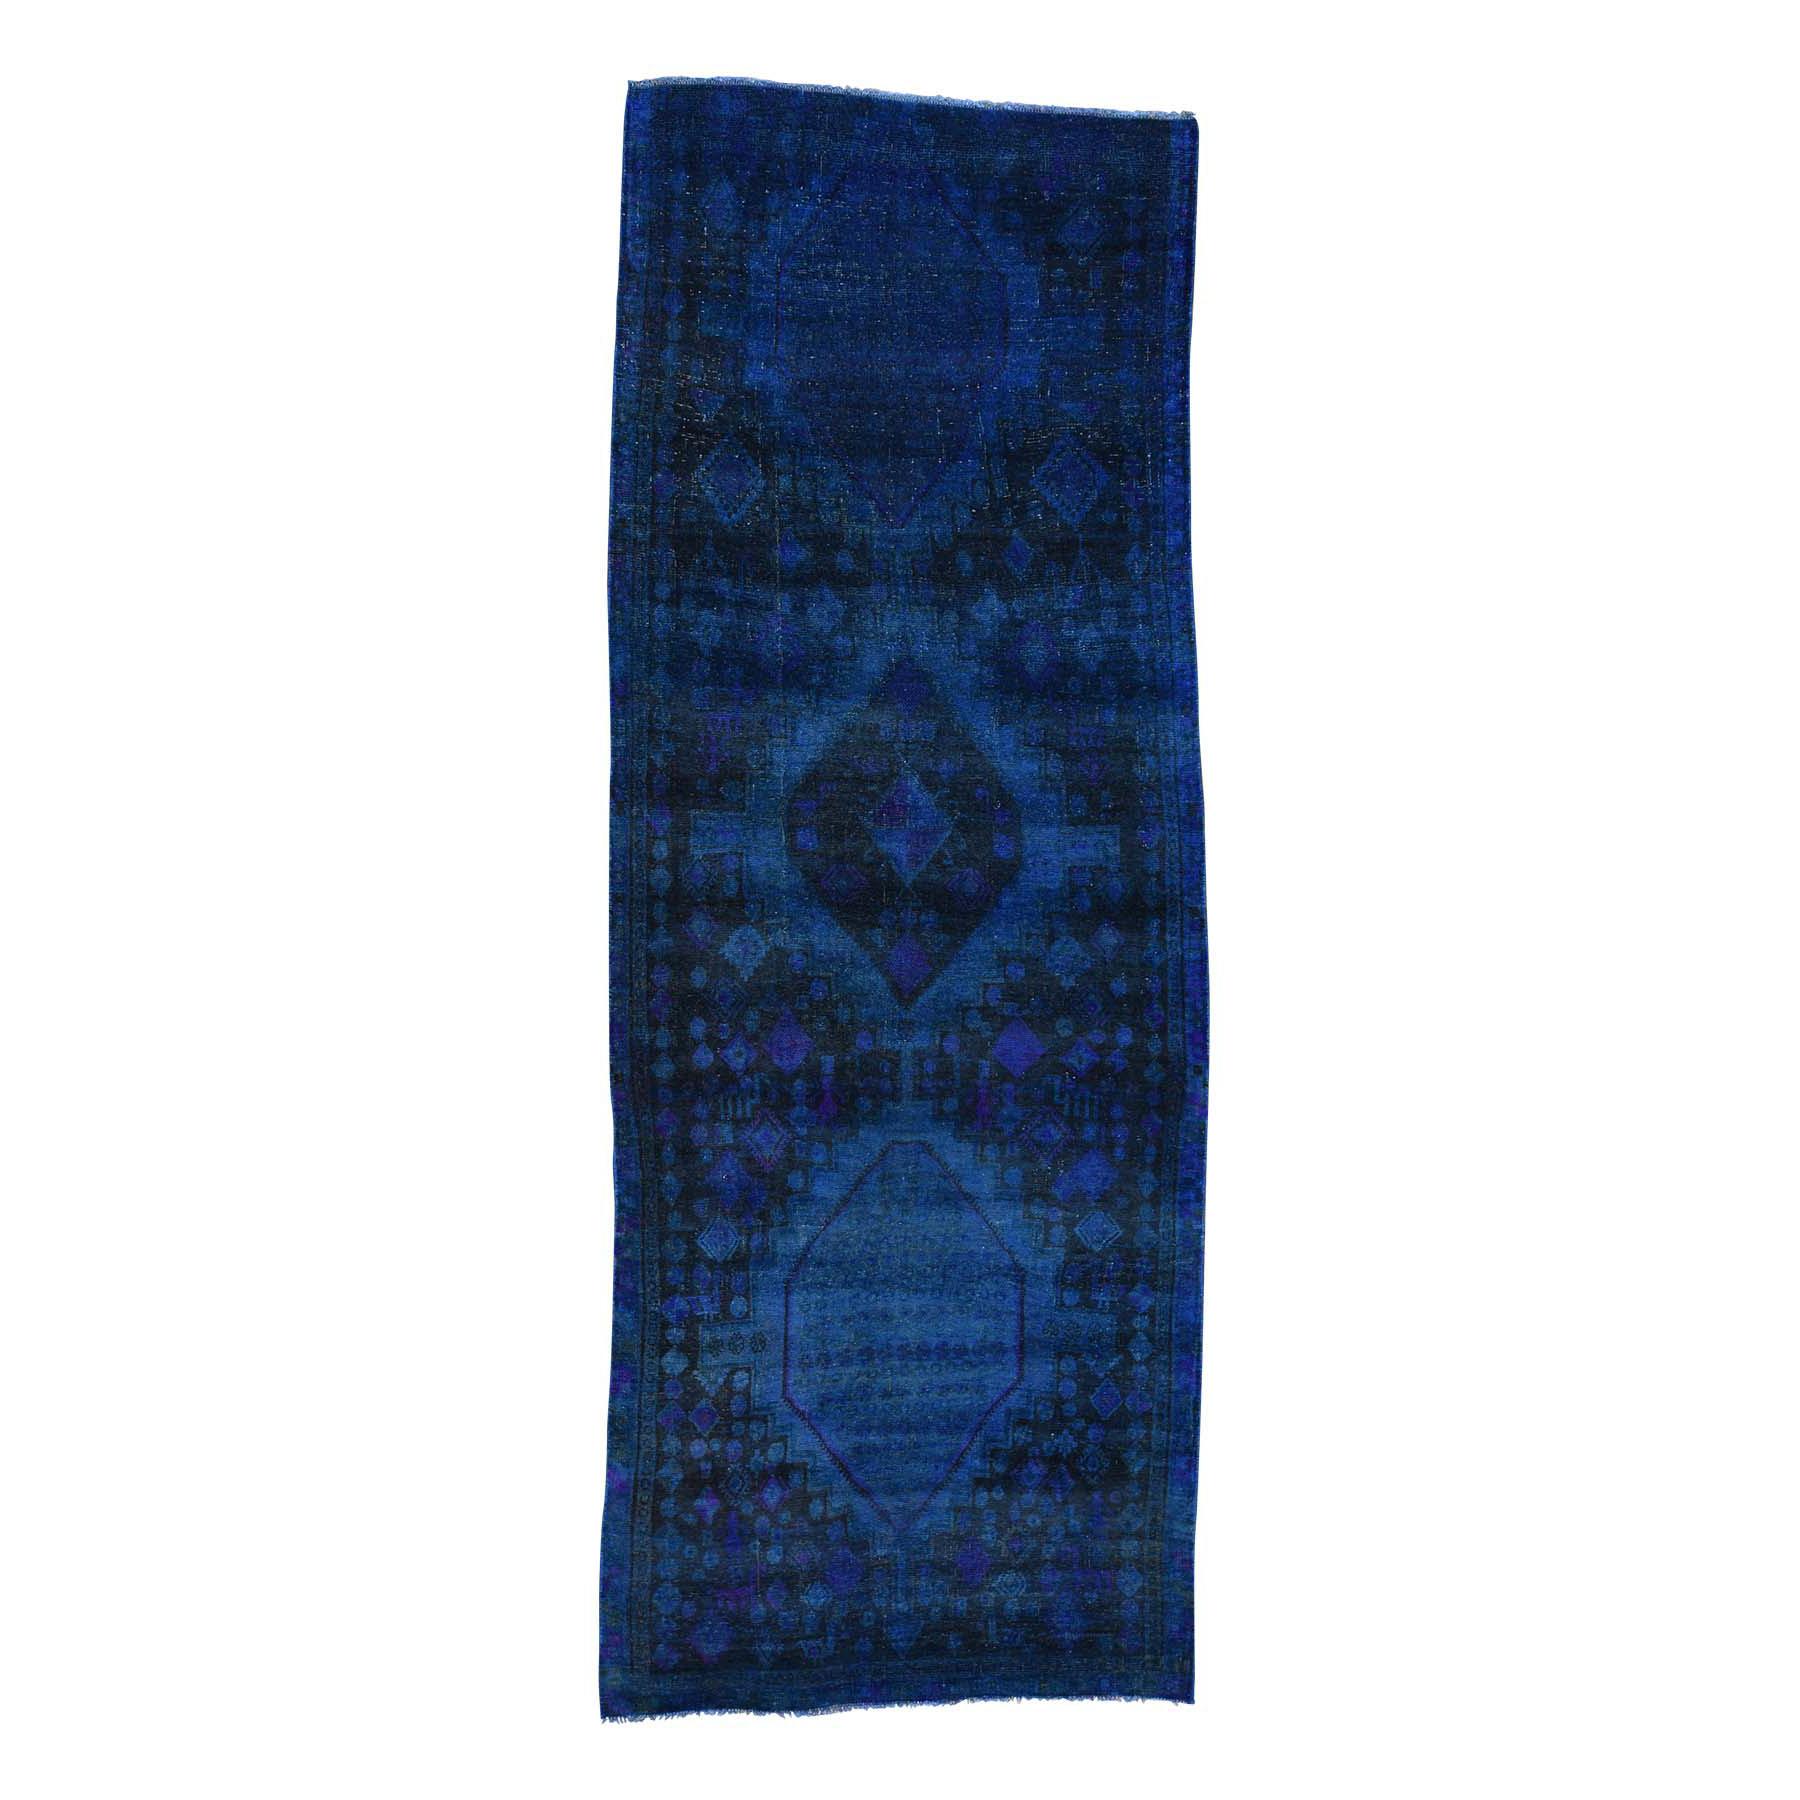 "4'X10'6"" Handmade Overdyed Persian Malayer Vintage Wide Runner Carpet moacaa6c"